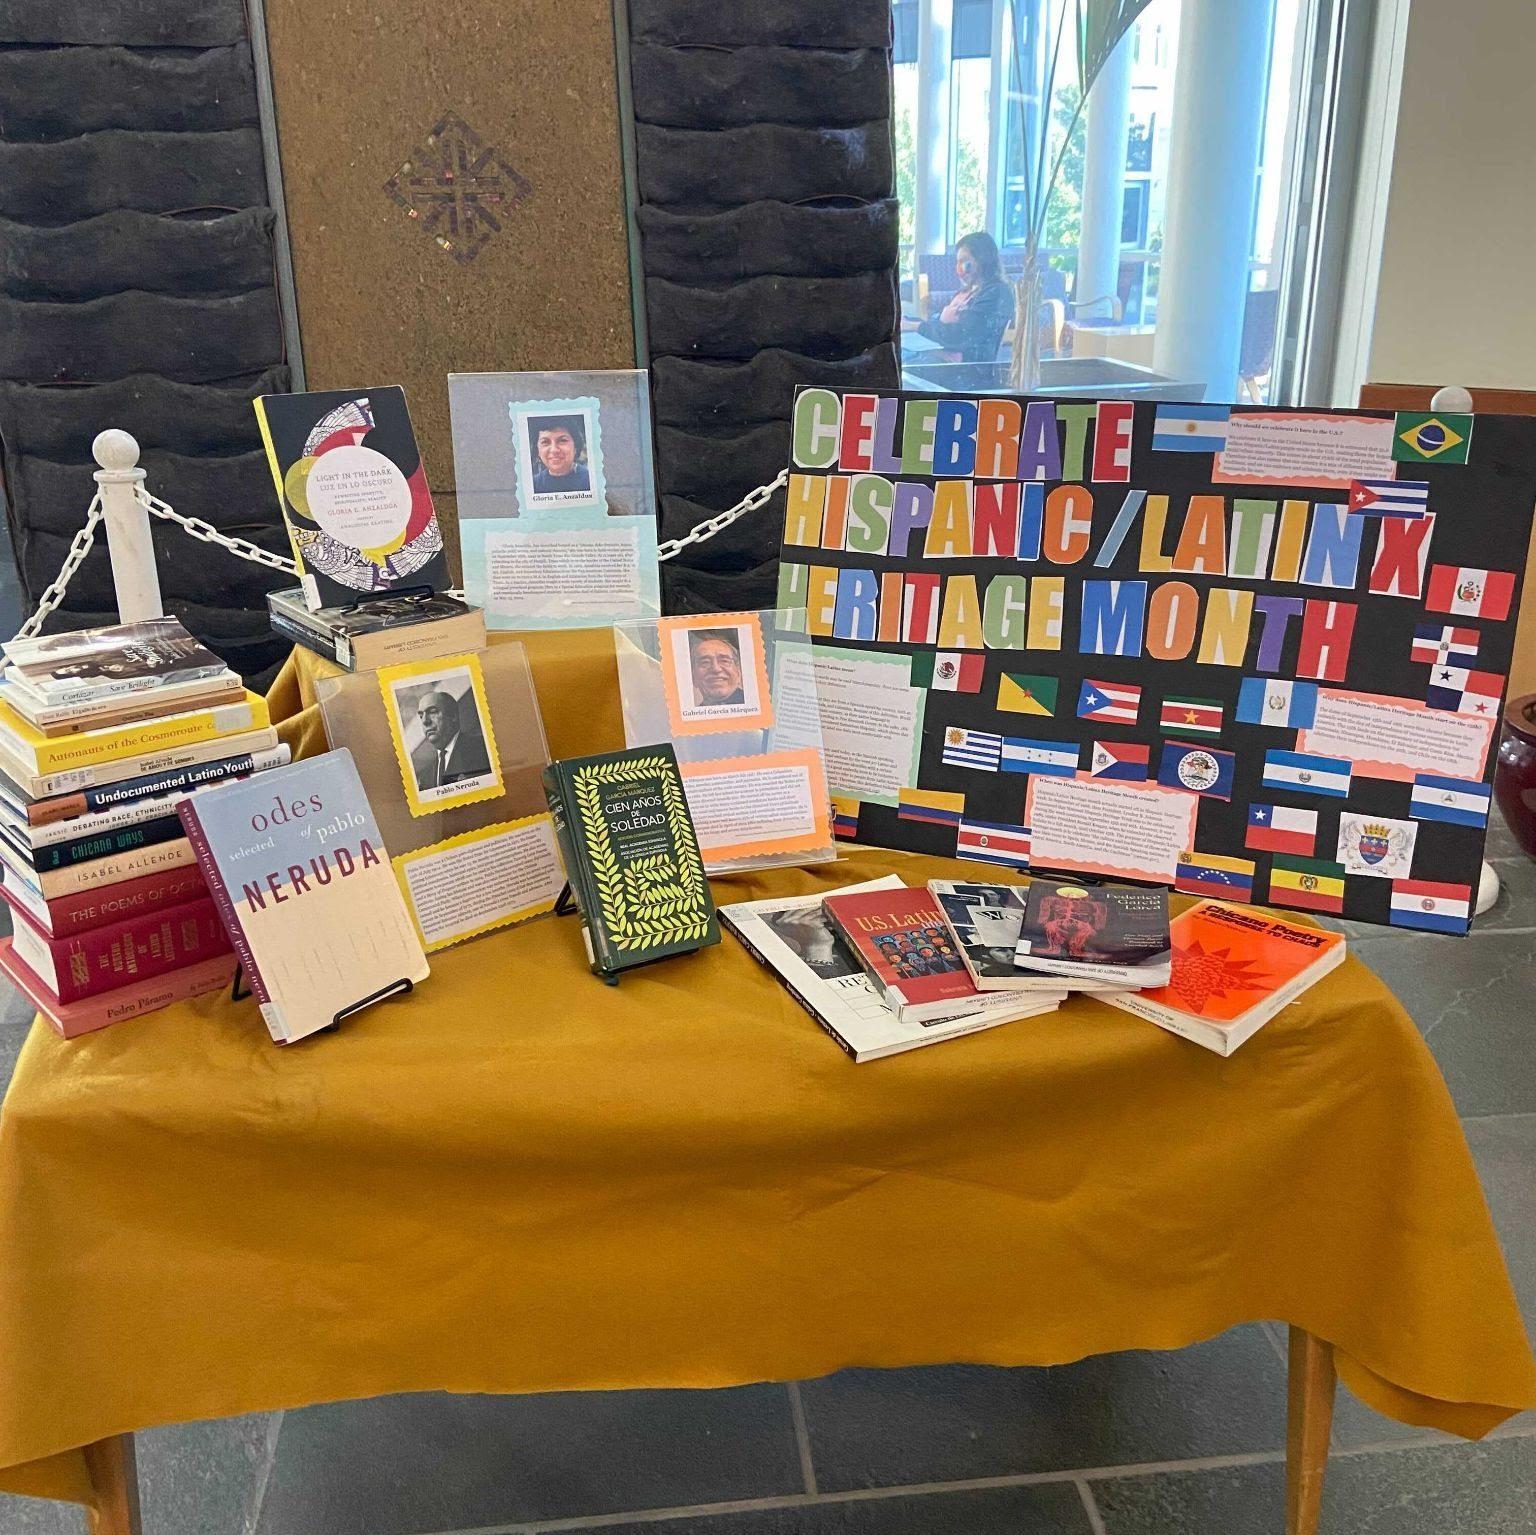 Hispanic/Latinx Heritage Month book display in Gleeson Library lobby